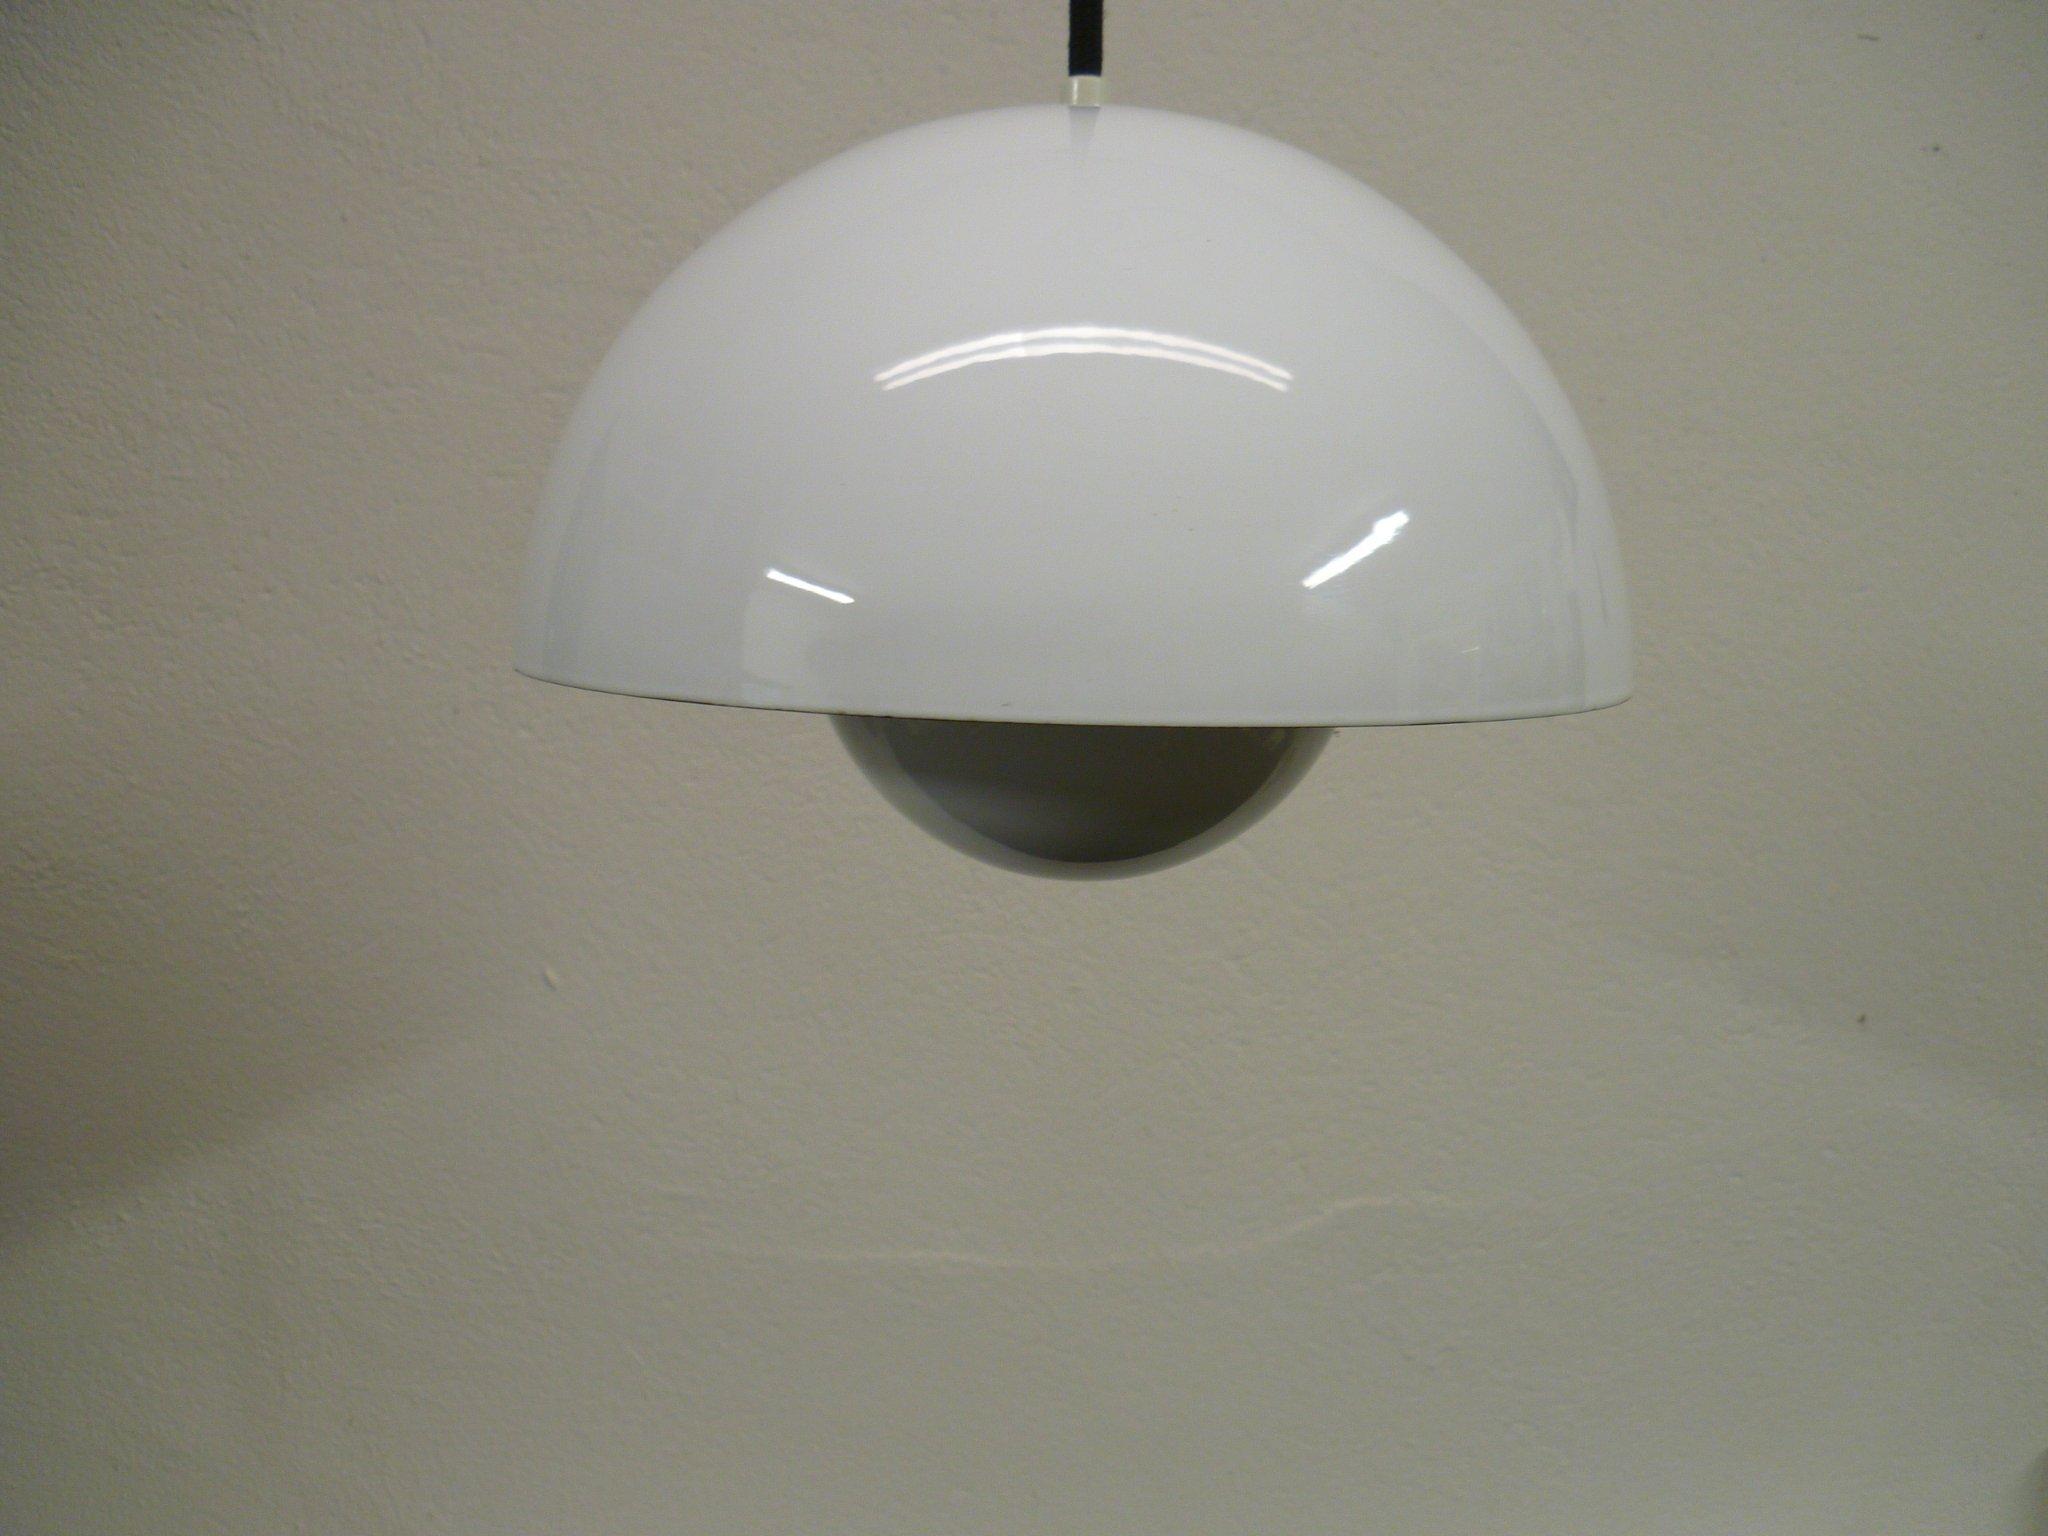 Taklampa fönsterlampa Flower Pot, design Verner Panton, 19601970 tal, vit